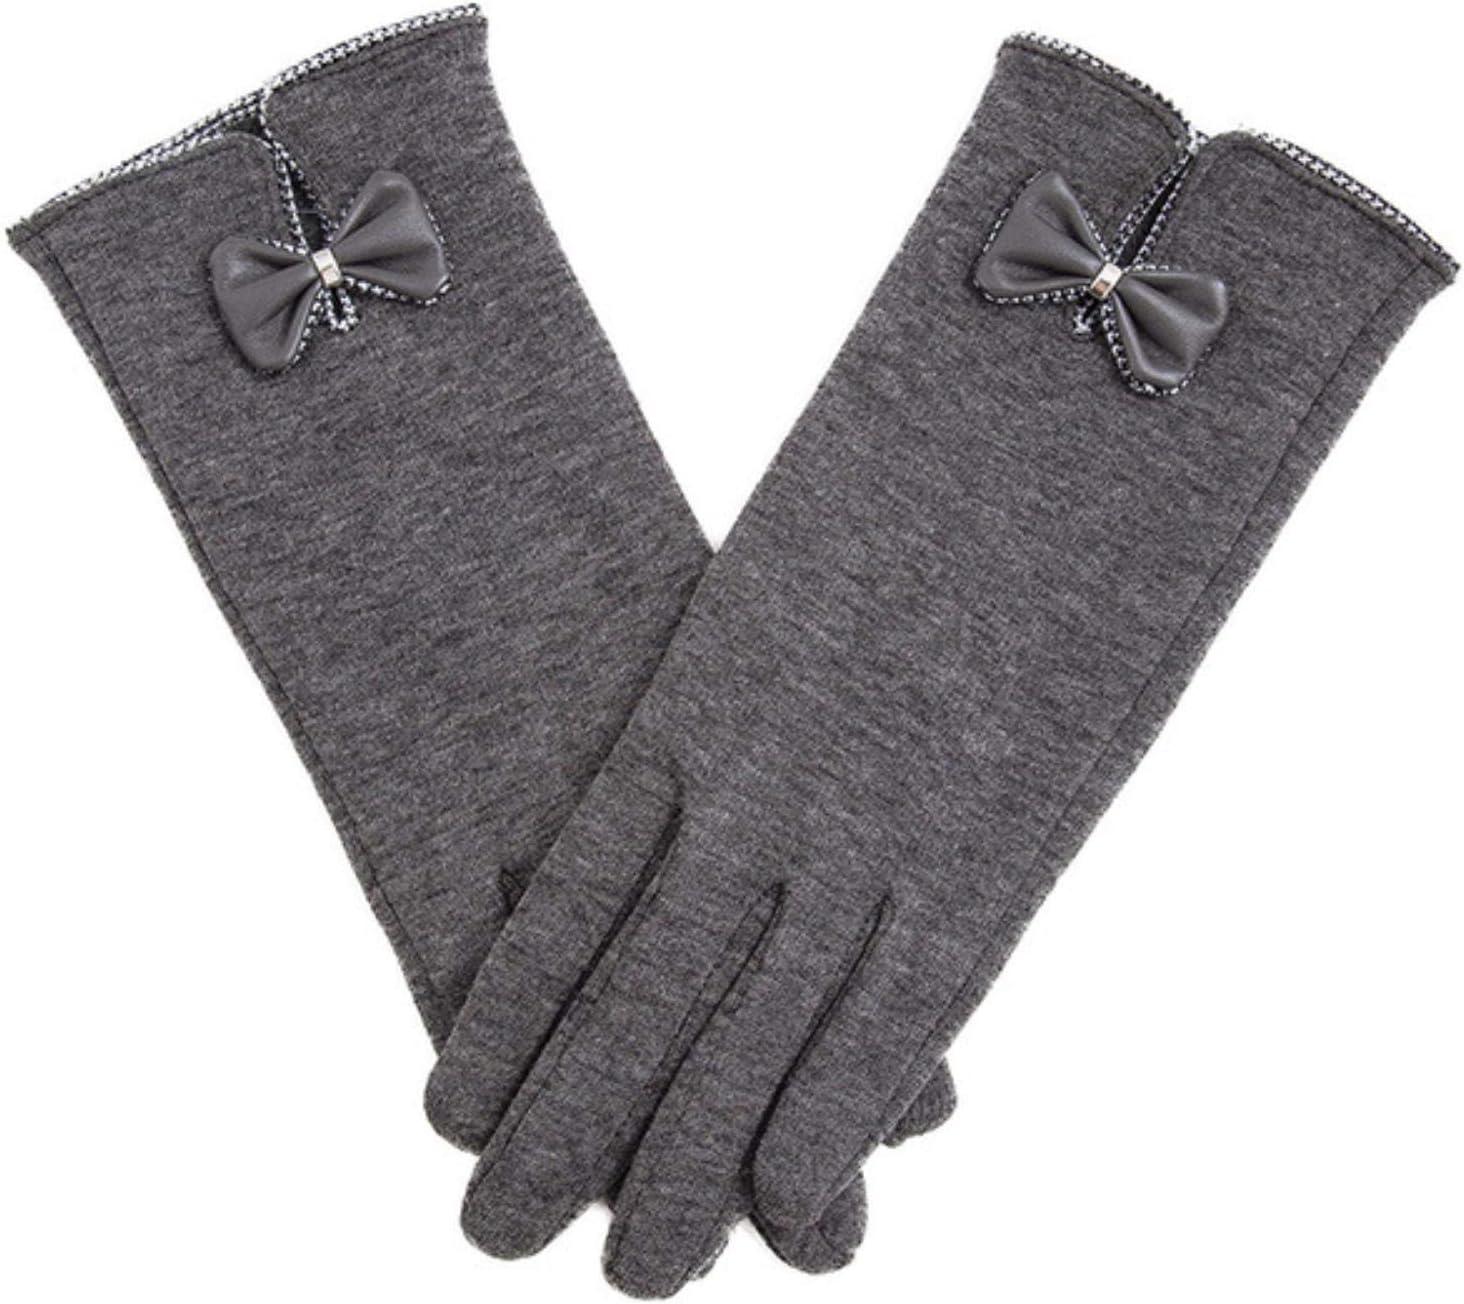 Fashion Elegant Women Touch Screen Glove Winter Female Lace Warm Cashmere Bow Full Finger Mittens Wrist